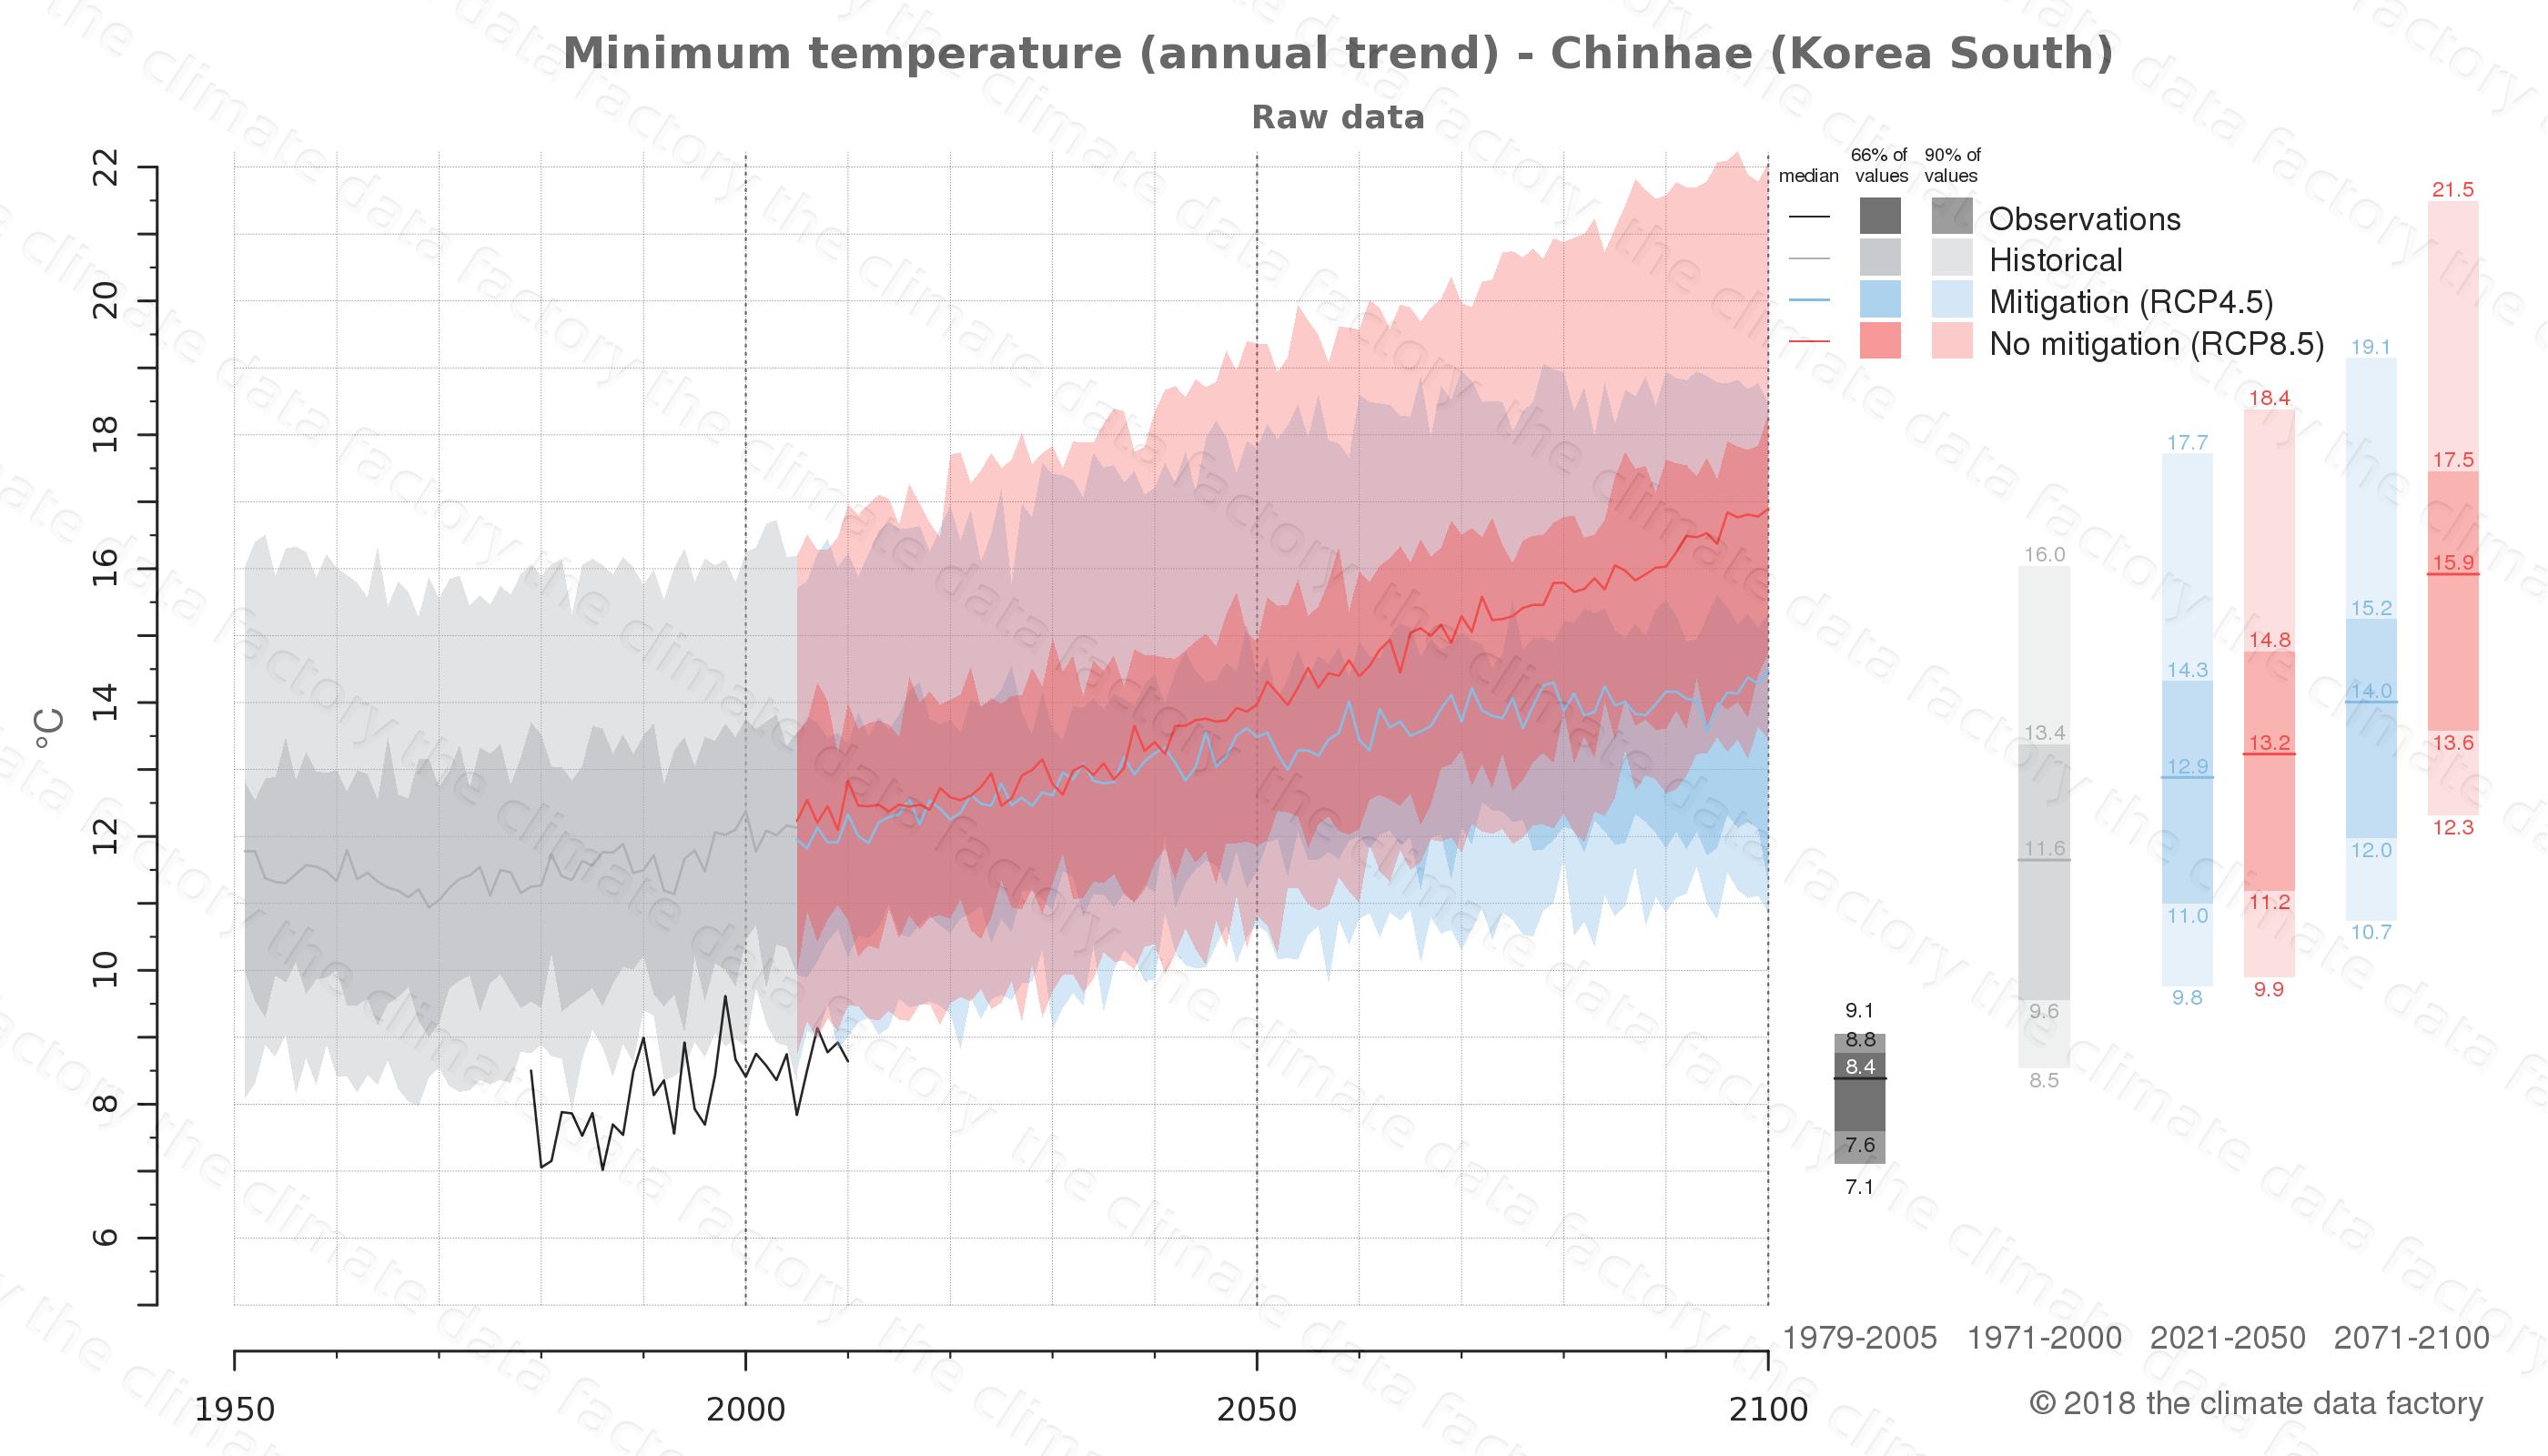 climate change data policy adaptation climate graph city data minimum-temperature chinhae south korea